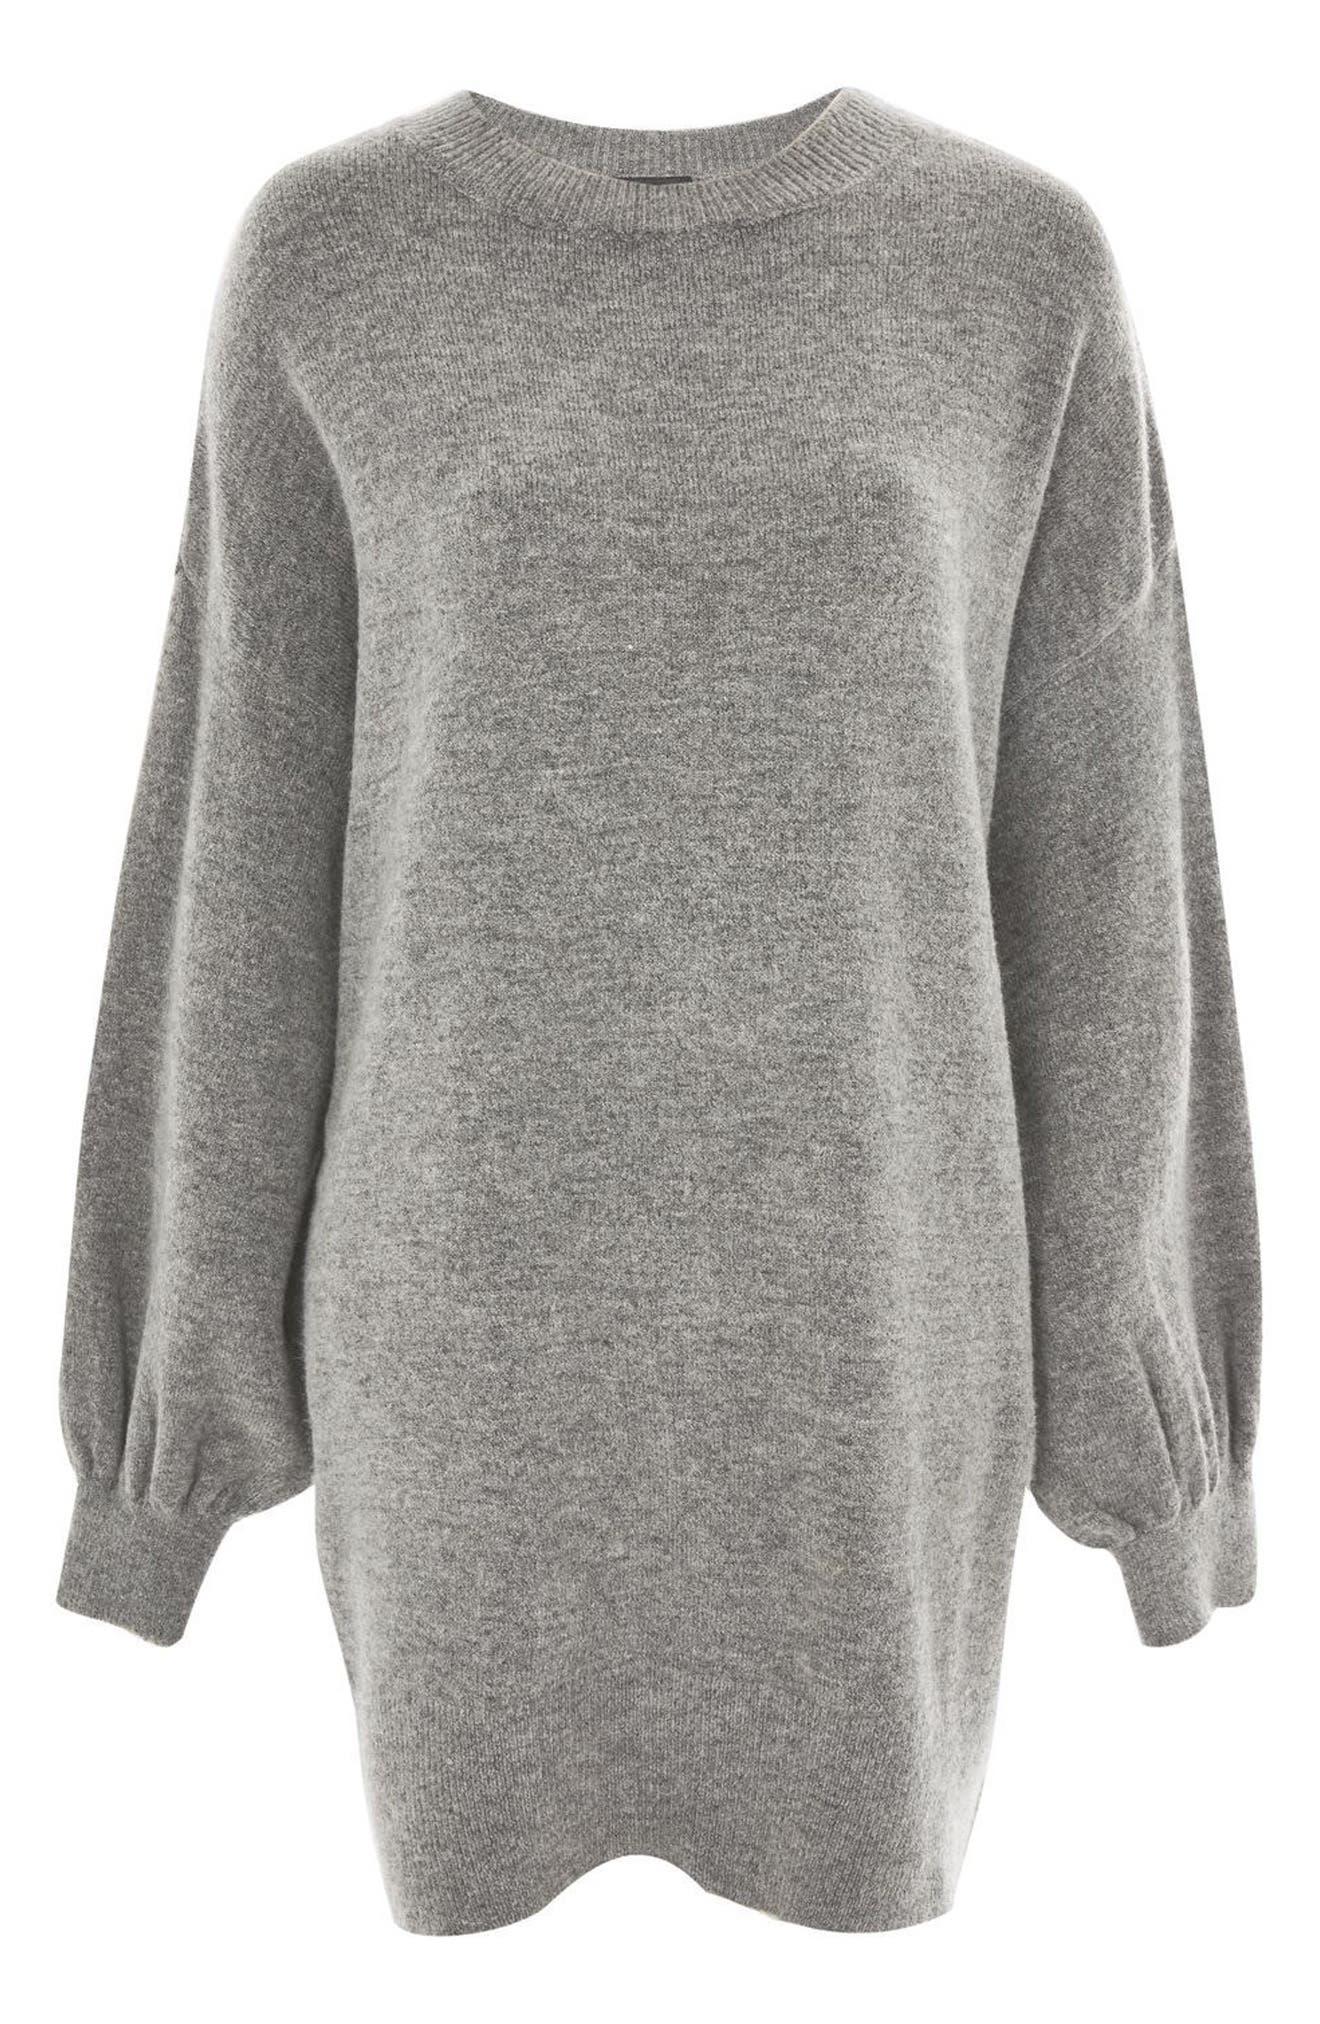 TOPSHOP, Sweater Dress, Alternate thumbnail 4, color, 021